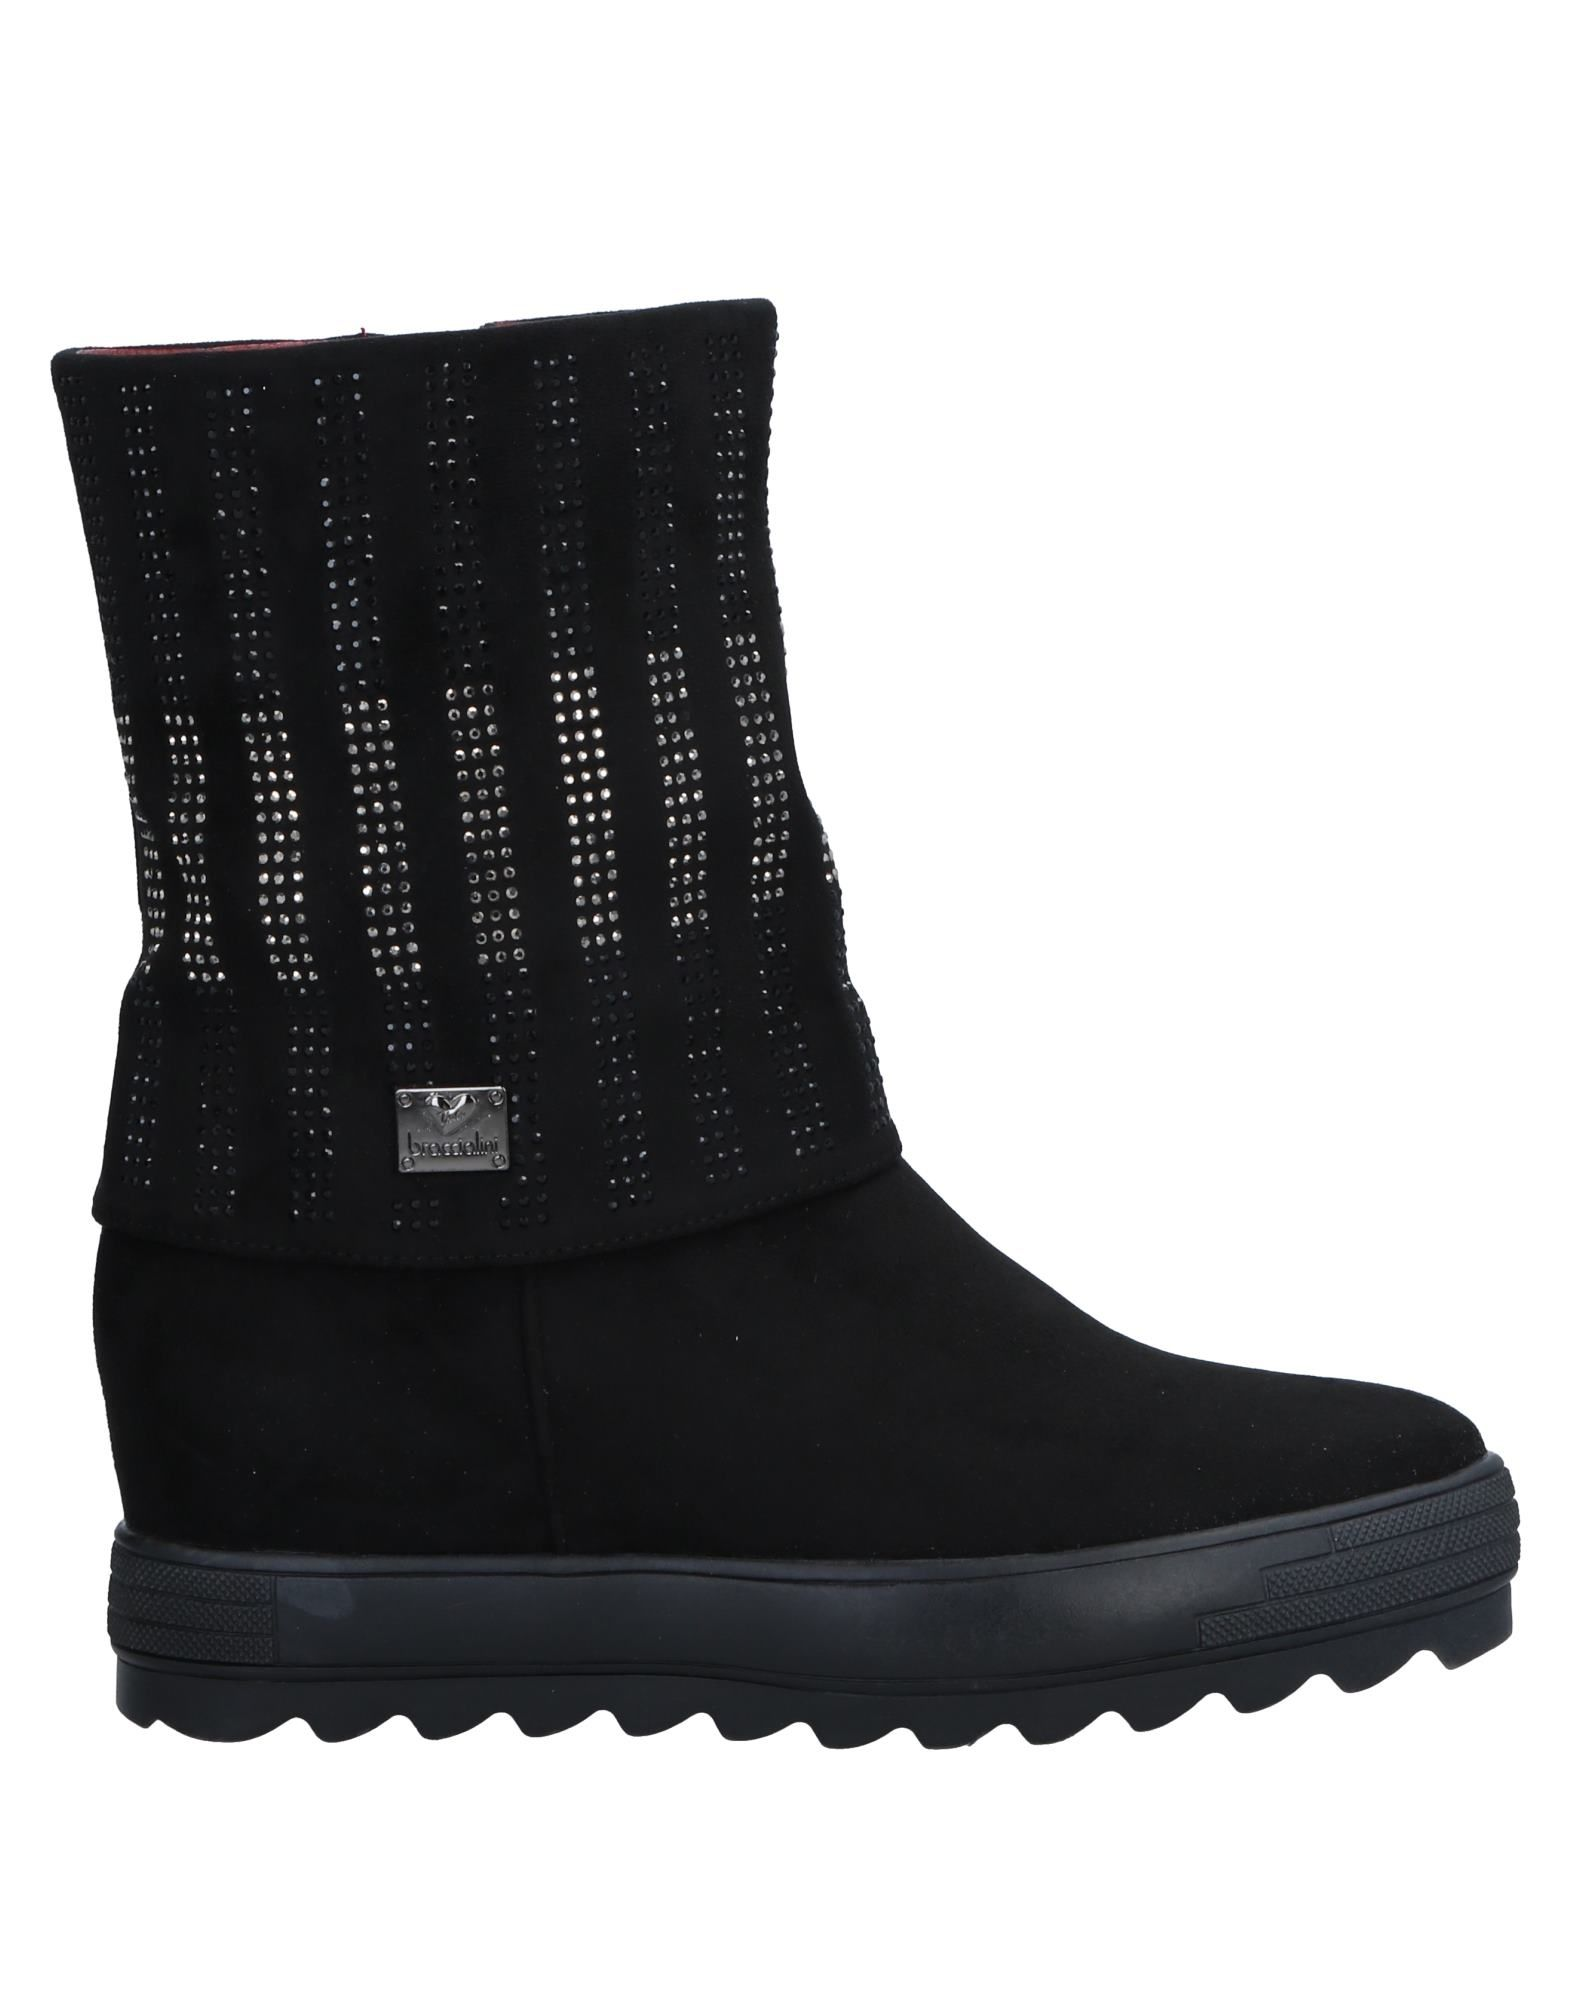 Tua By Braccialini Stiefelette Damen  11526240PE Gute Qualität beliebte Schuhe